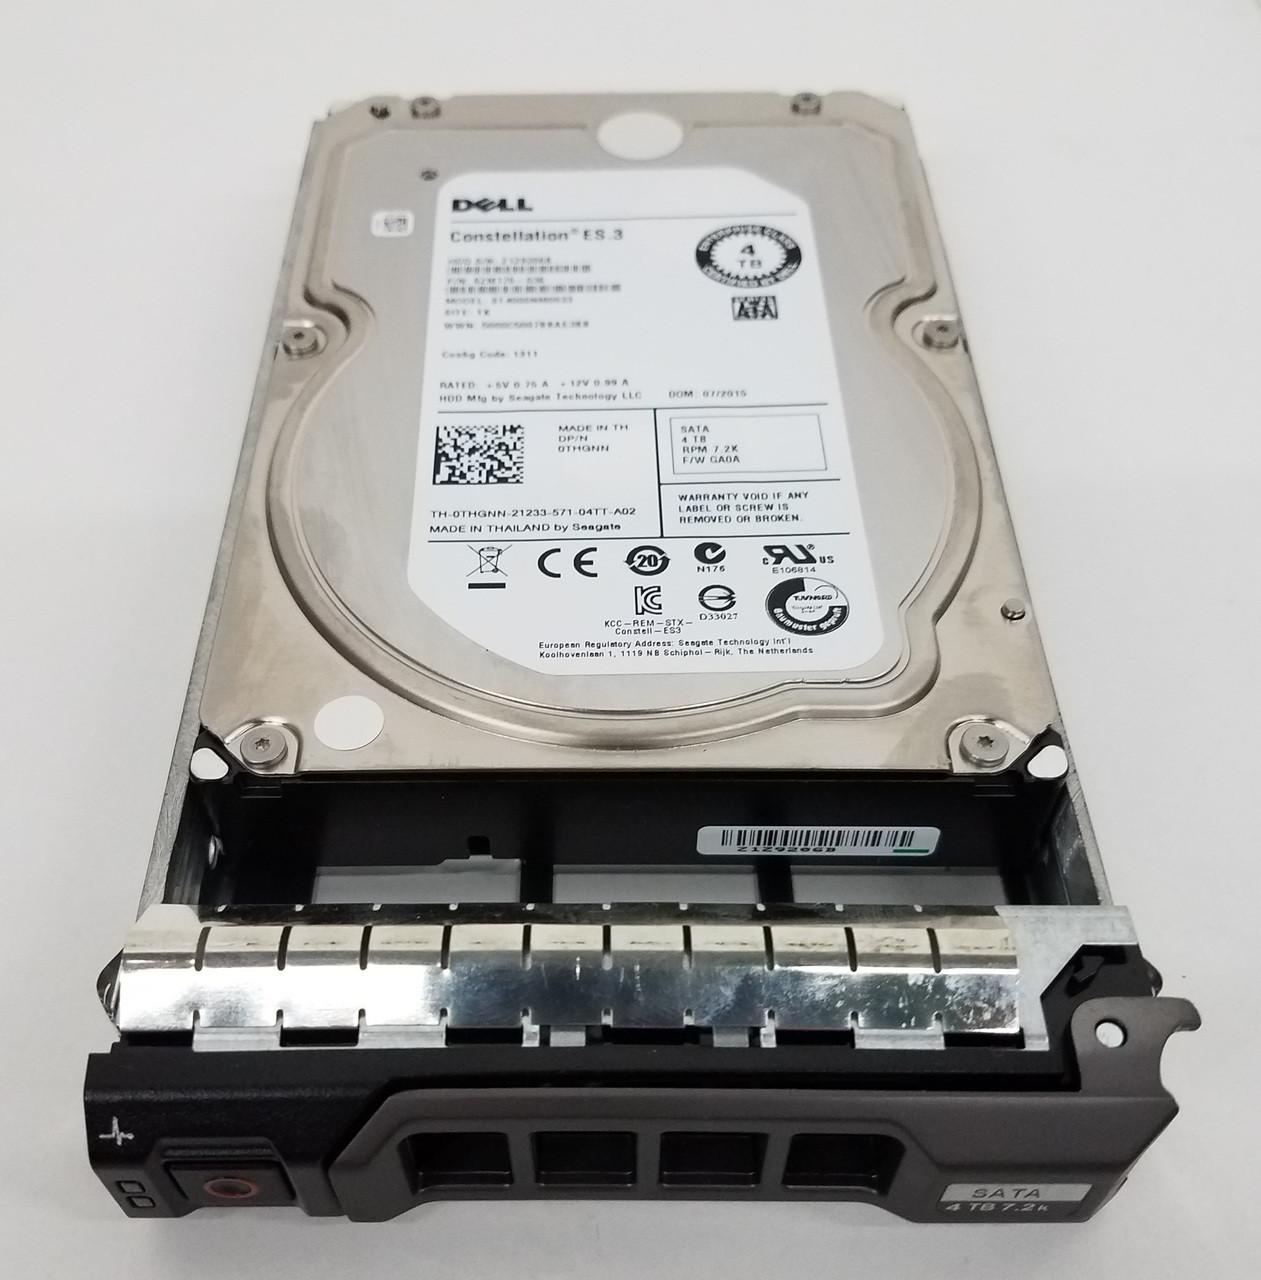 1 Year Warranty New Dell PowerEdge T300 Hot Swap 1TB SAS Hard Drive